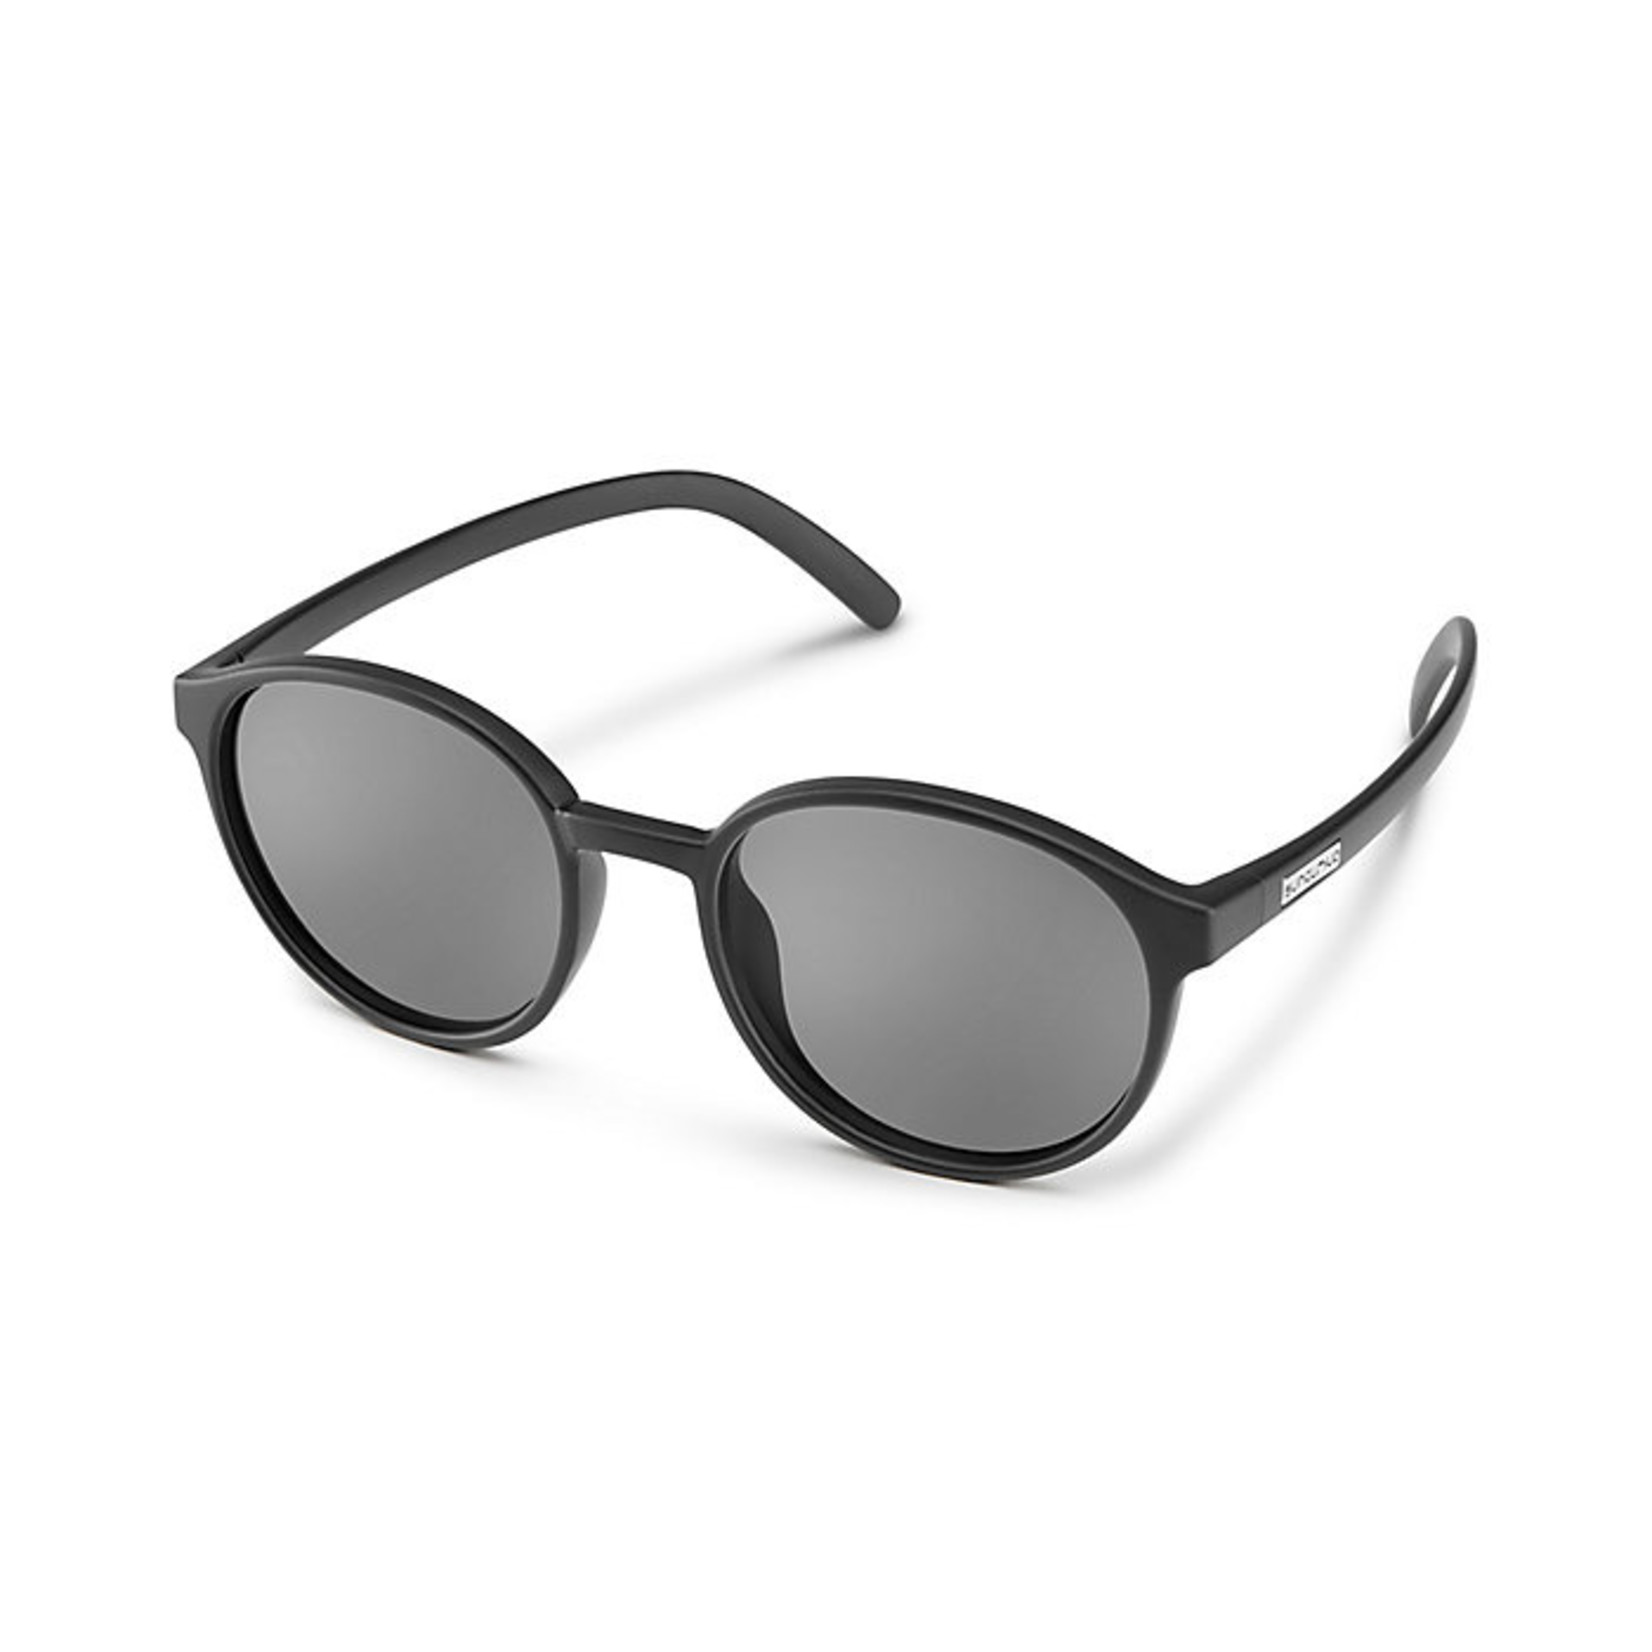 Suncloud Optics Suncloud Low Key Polarized Sunglasses